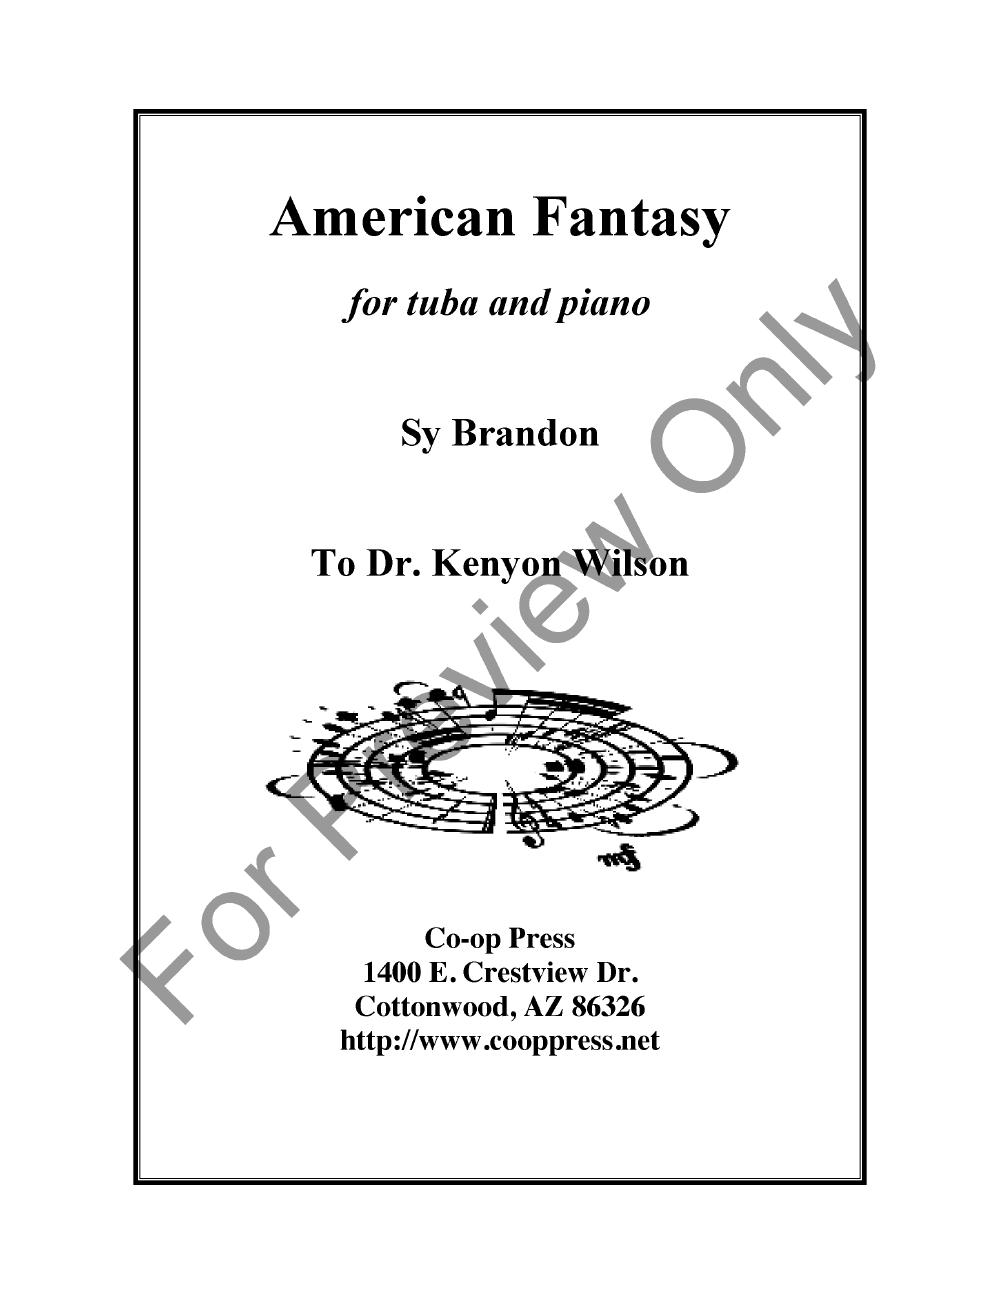 American Fantasy Thumbnail